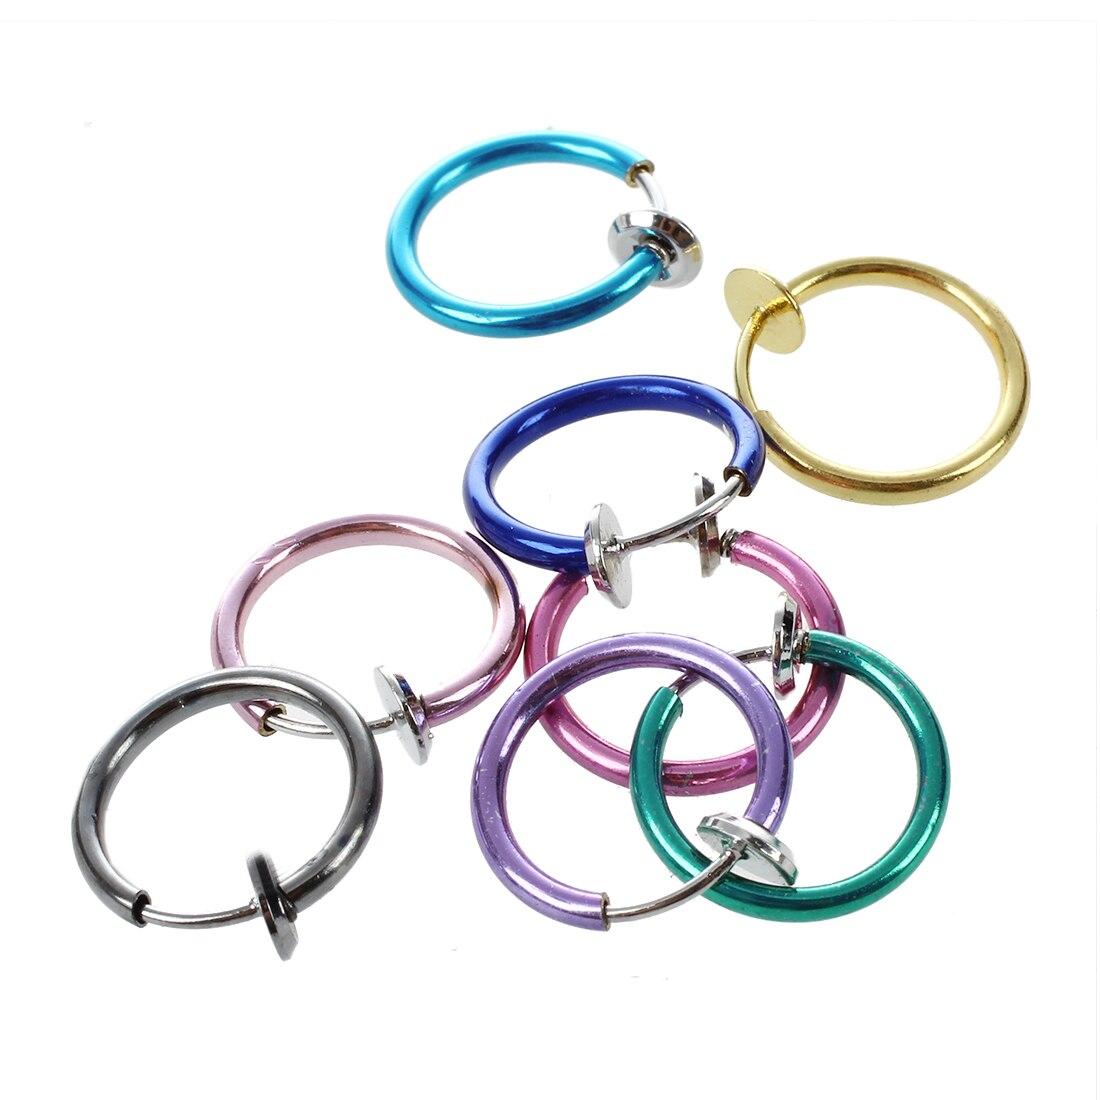 8 Lots Mix Color Clip on Nose Lip Ear Fake Stud Earrings Punk Goth Septum False Hoop Navel Body Piercing Jewelry